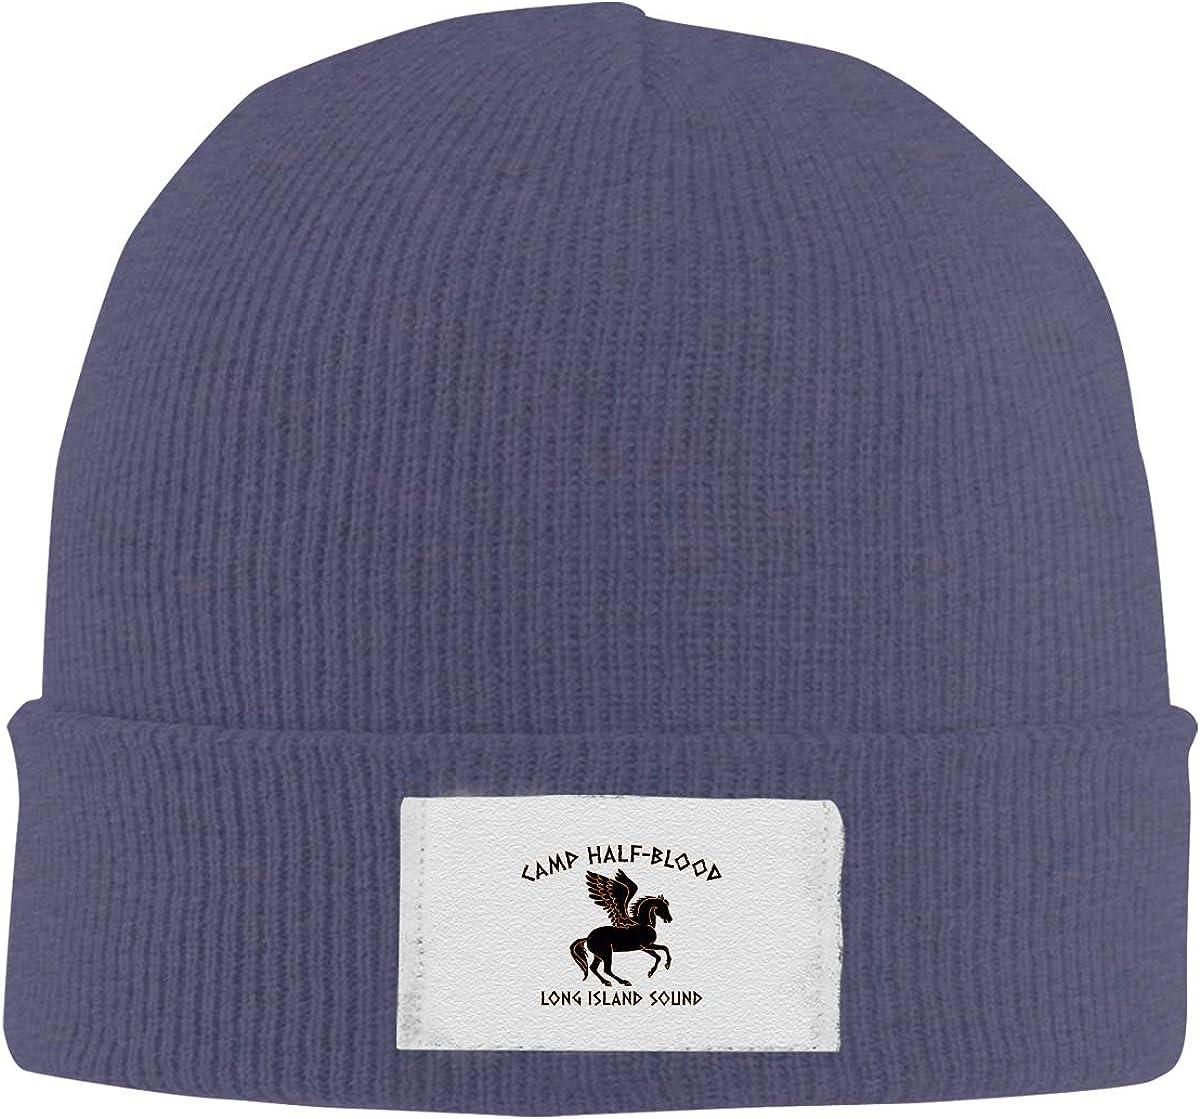 Dunpaiaa Skull Caps Camp Half Blood Winter Warm Knit Hats Stretchy Cuff Beanie Hat Black